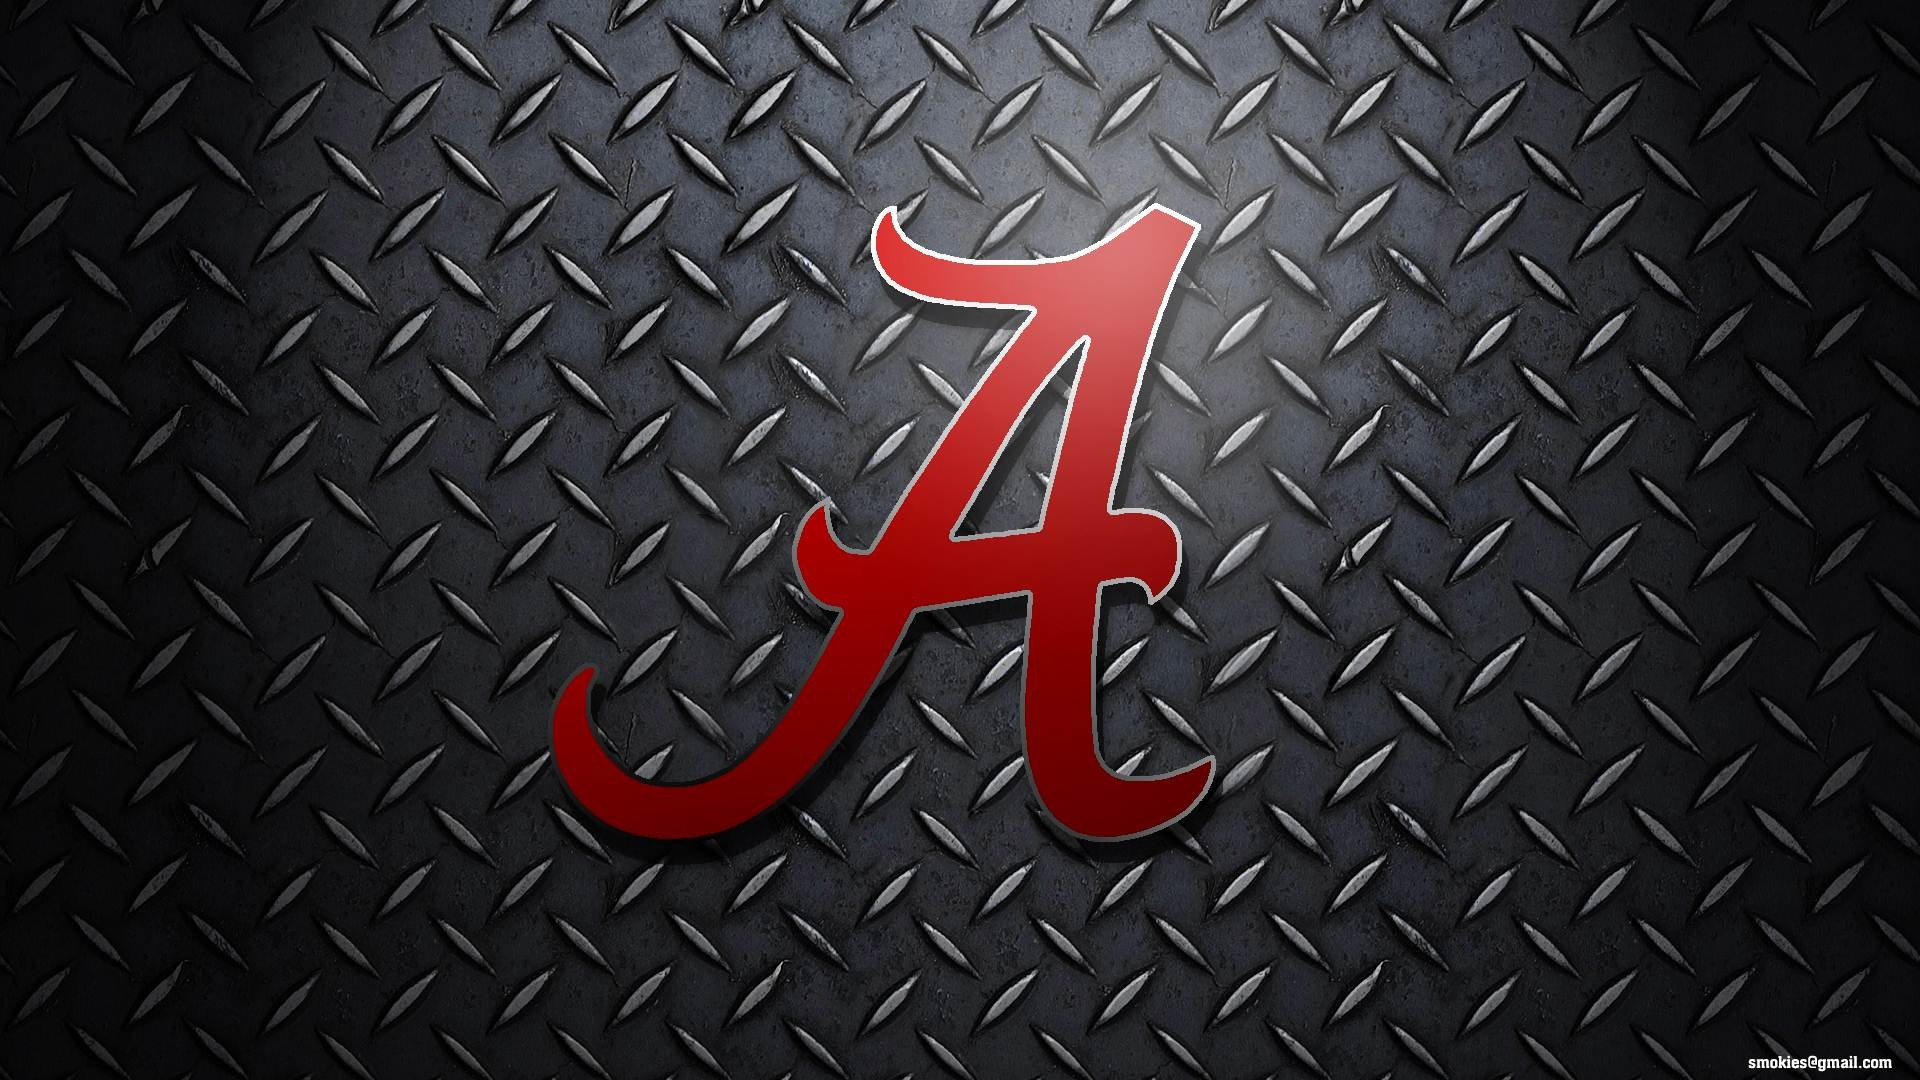 Free Alabama Crimson Tide Wallpapers Wallpaper | HD Wallpapers | Pinterest  | Football wallpaper and Wallpaper